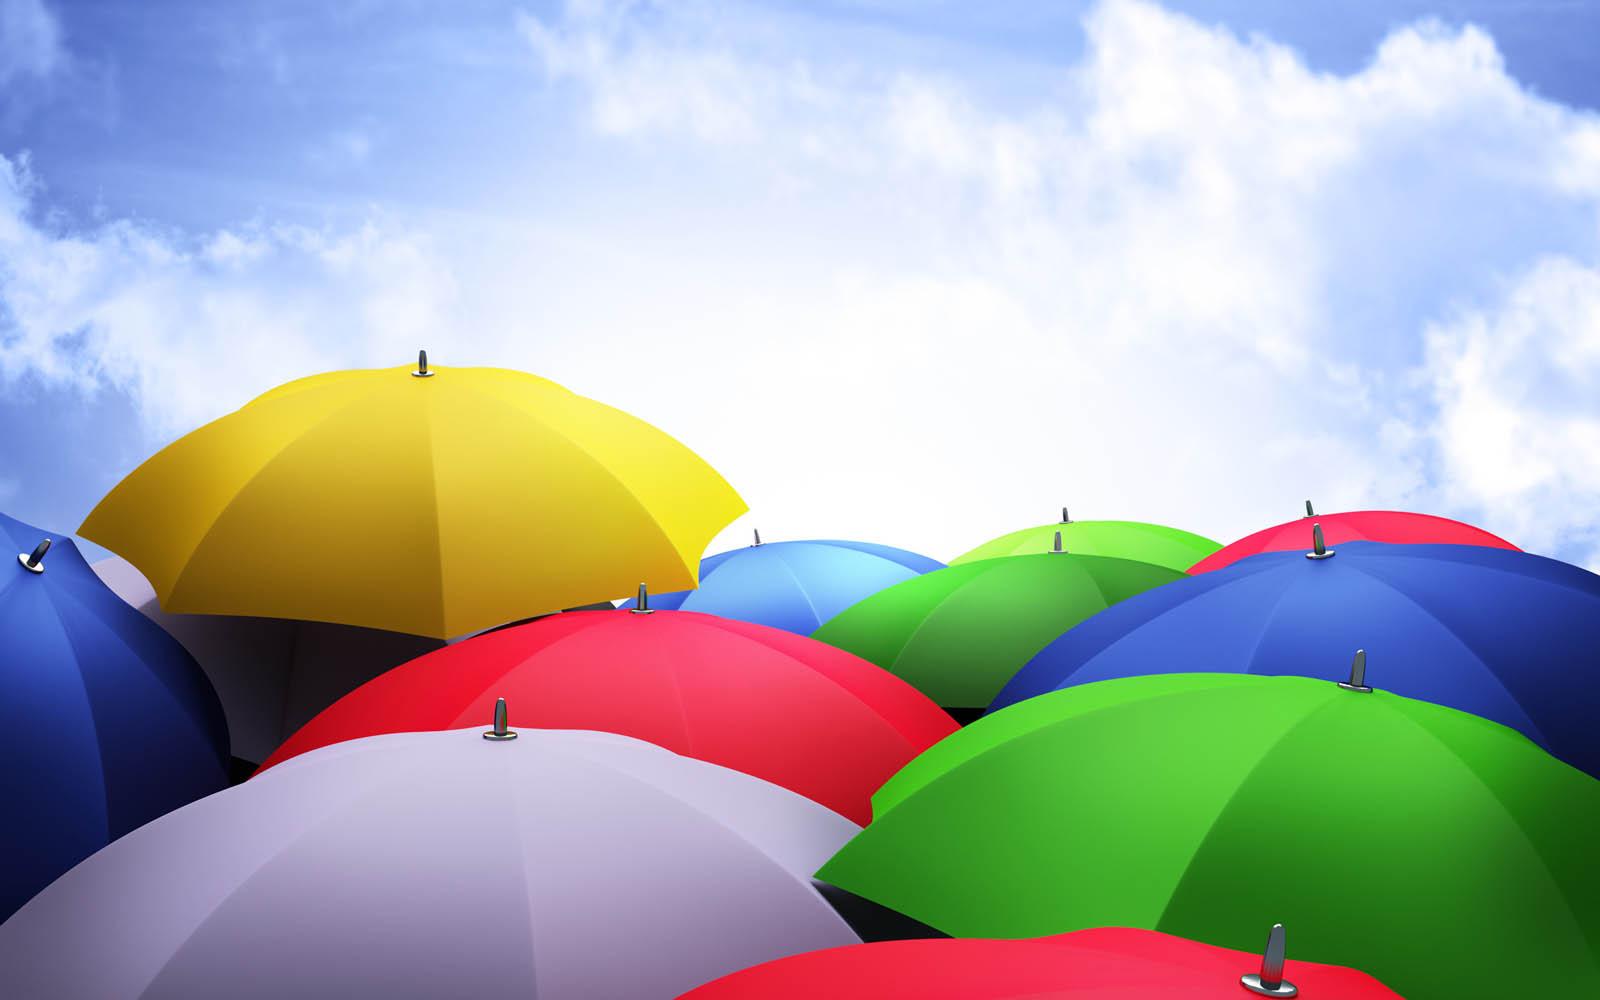 Wallpapers: Colorful Umbrellas